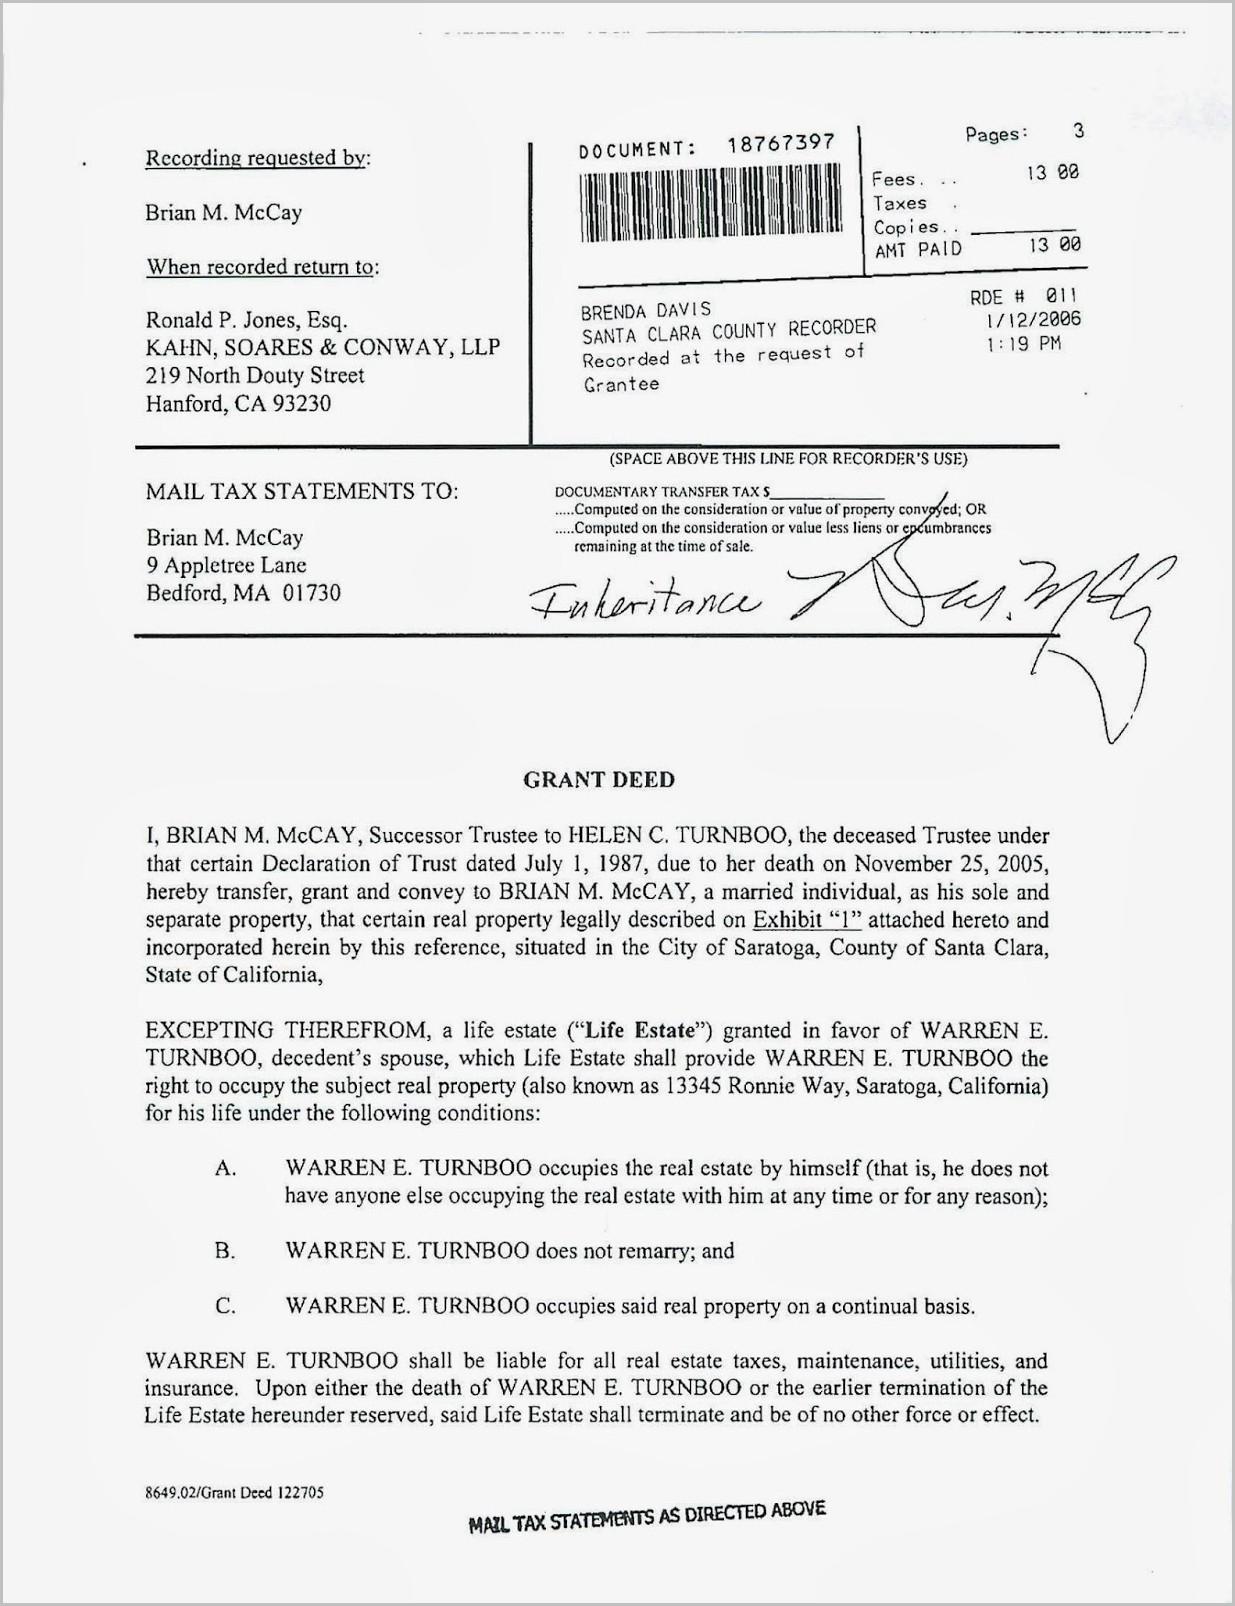 Grant Deed Transfer Form California